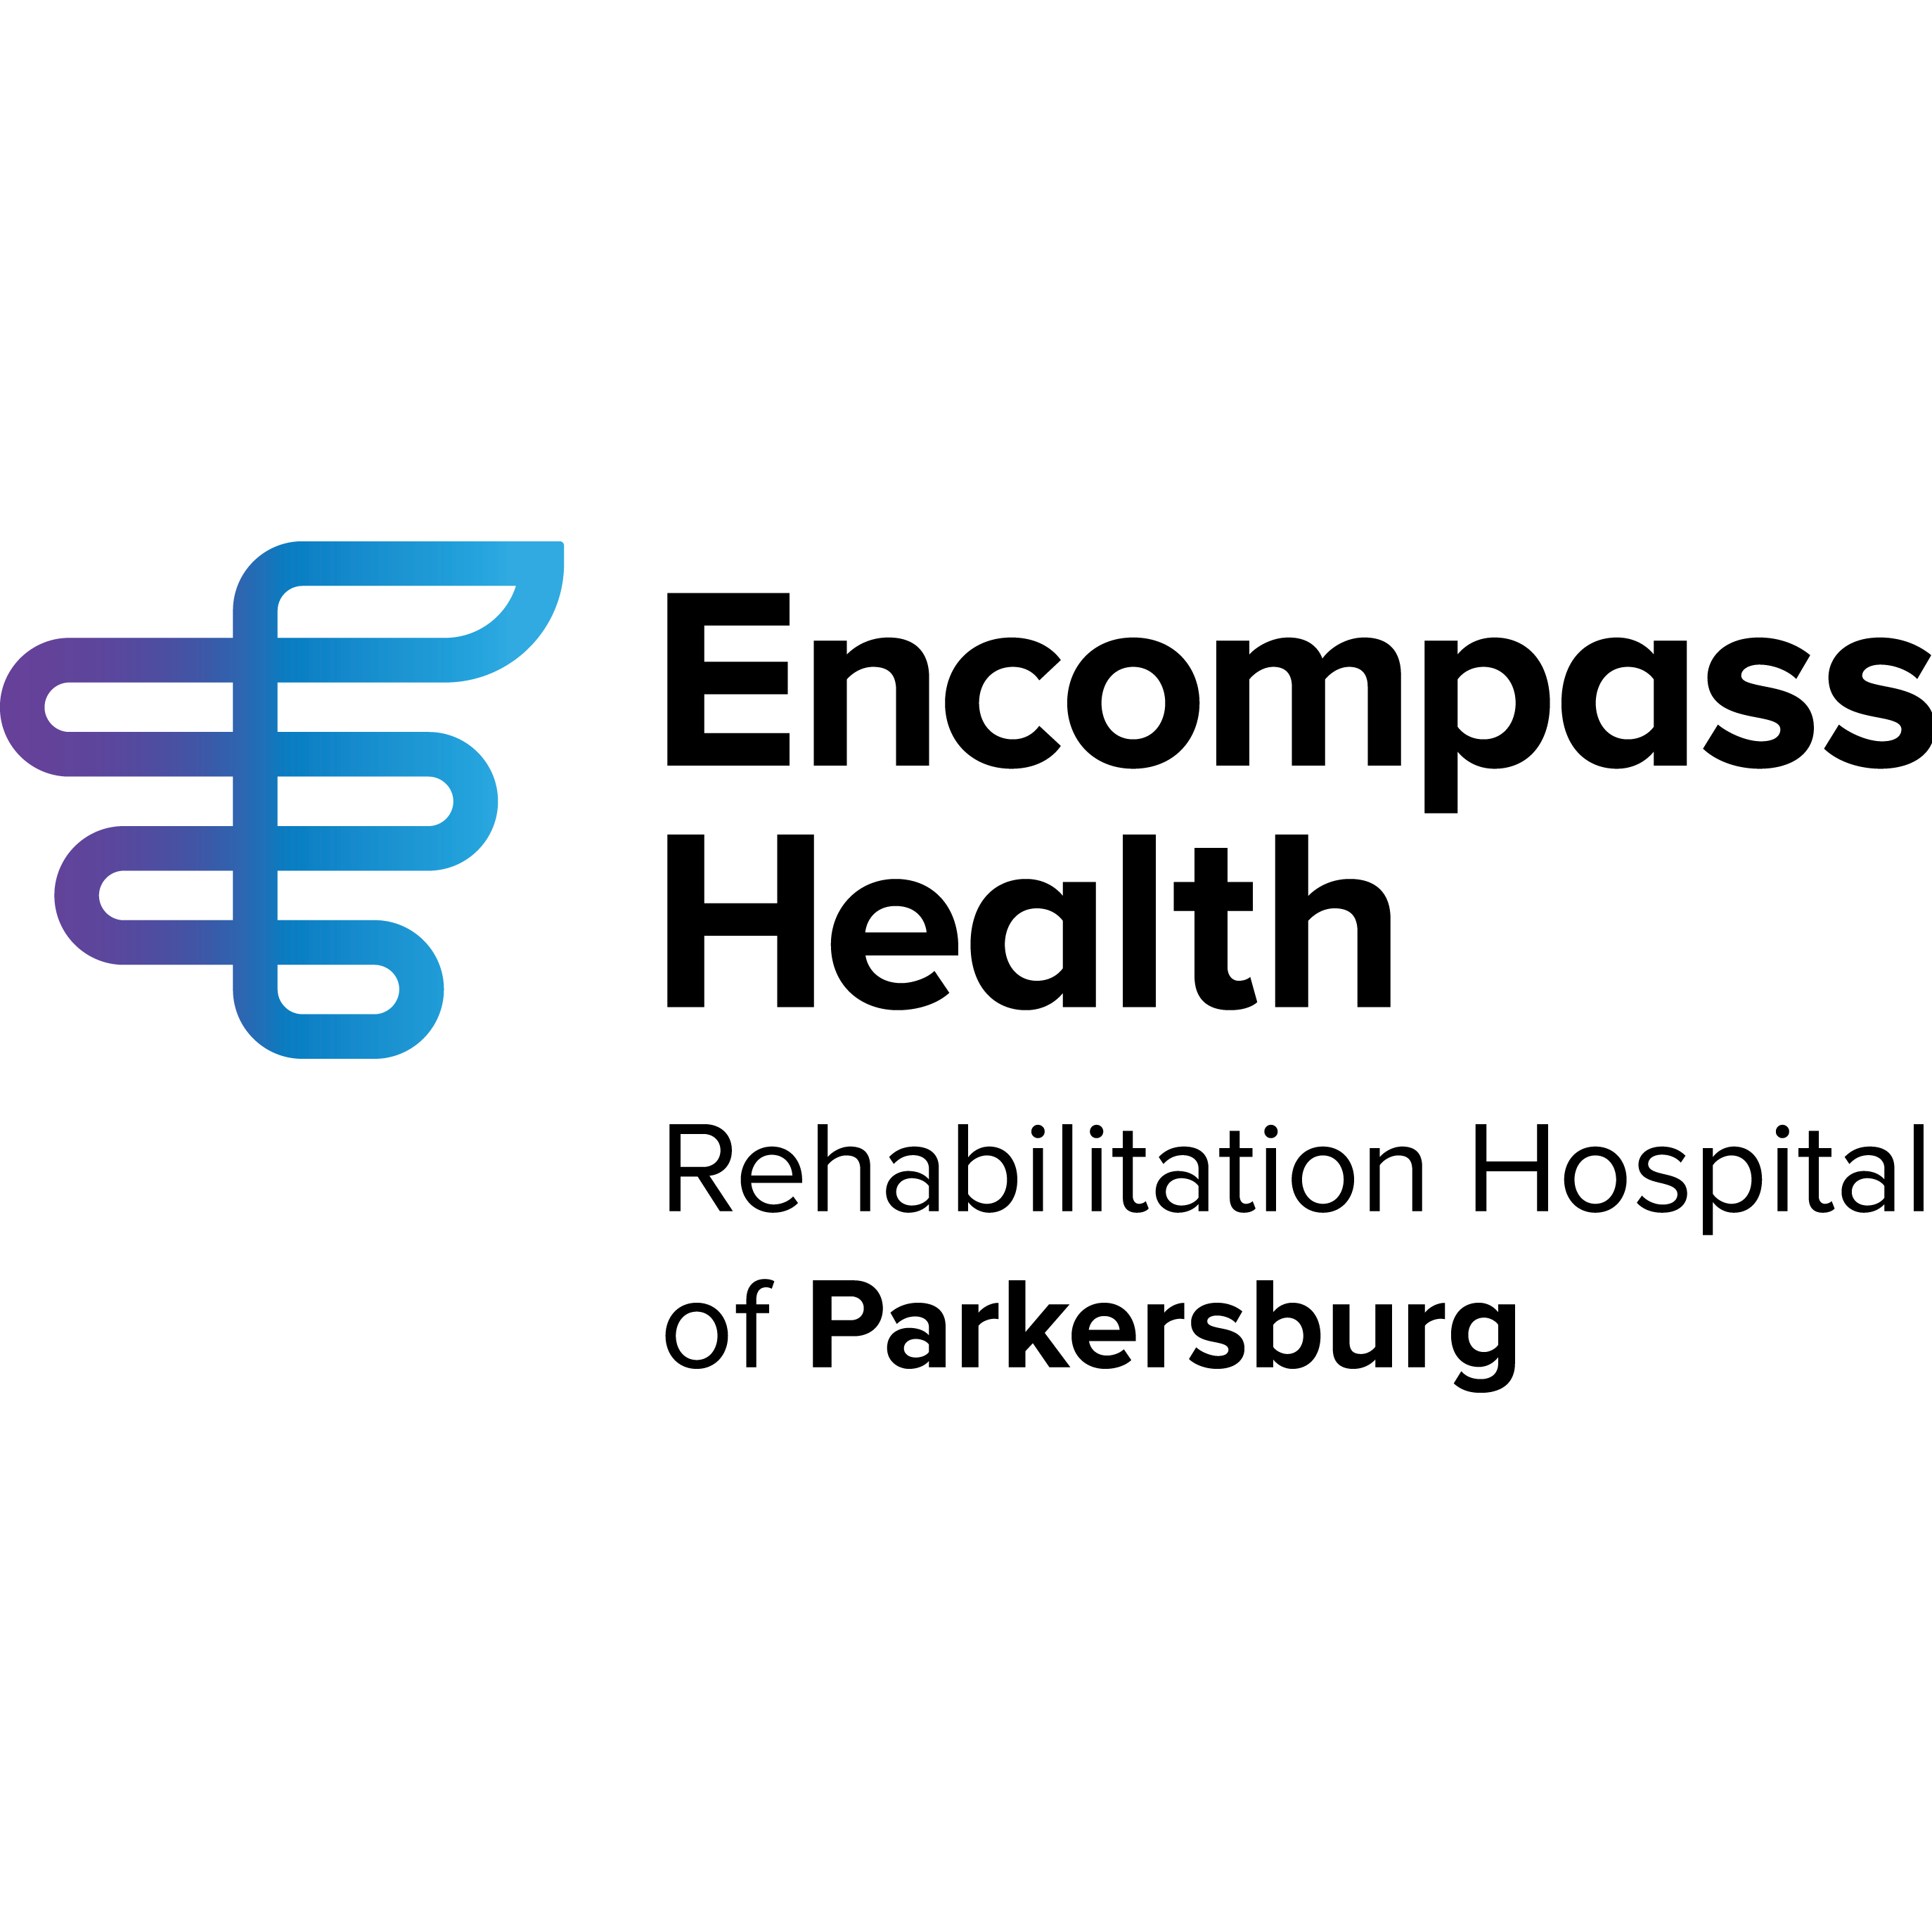 Encompass Health Rehabilitation Hospital of Parkersburg